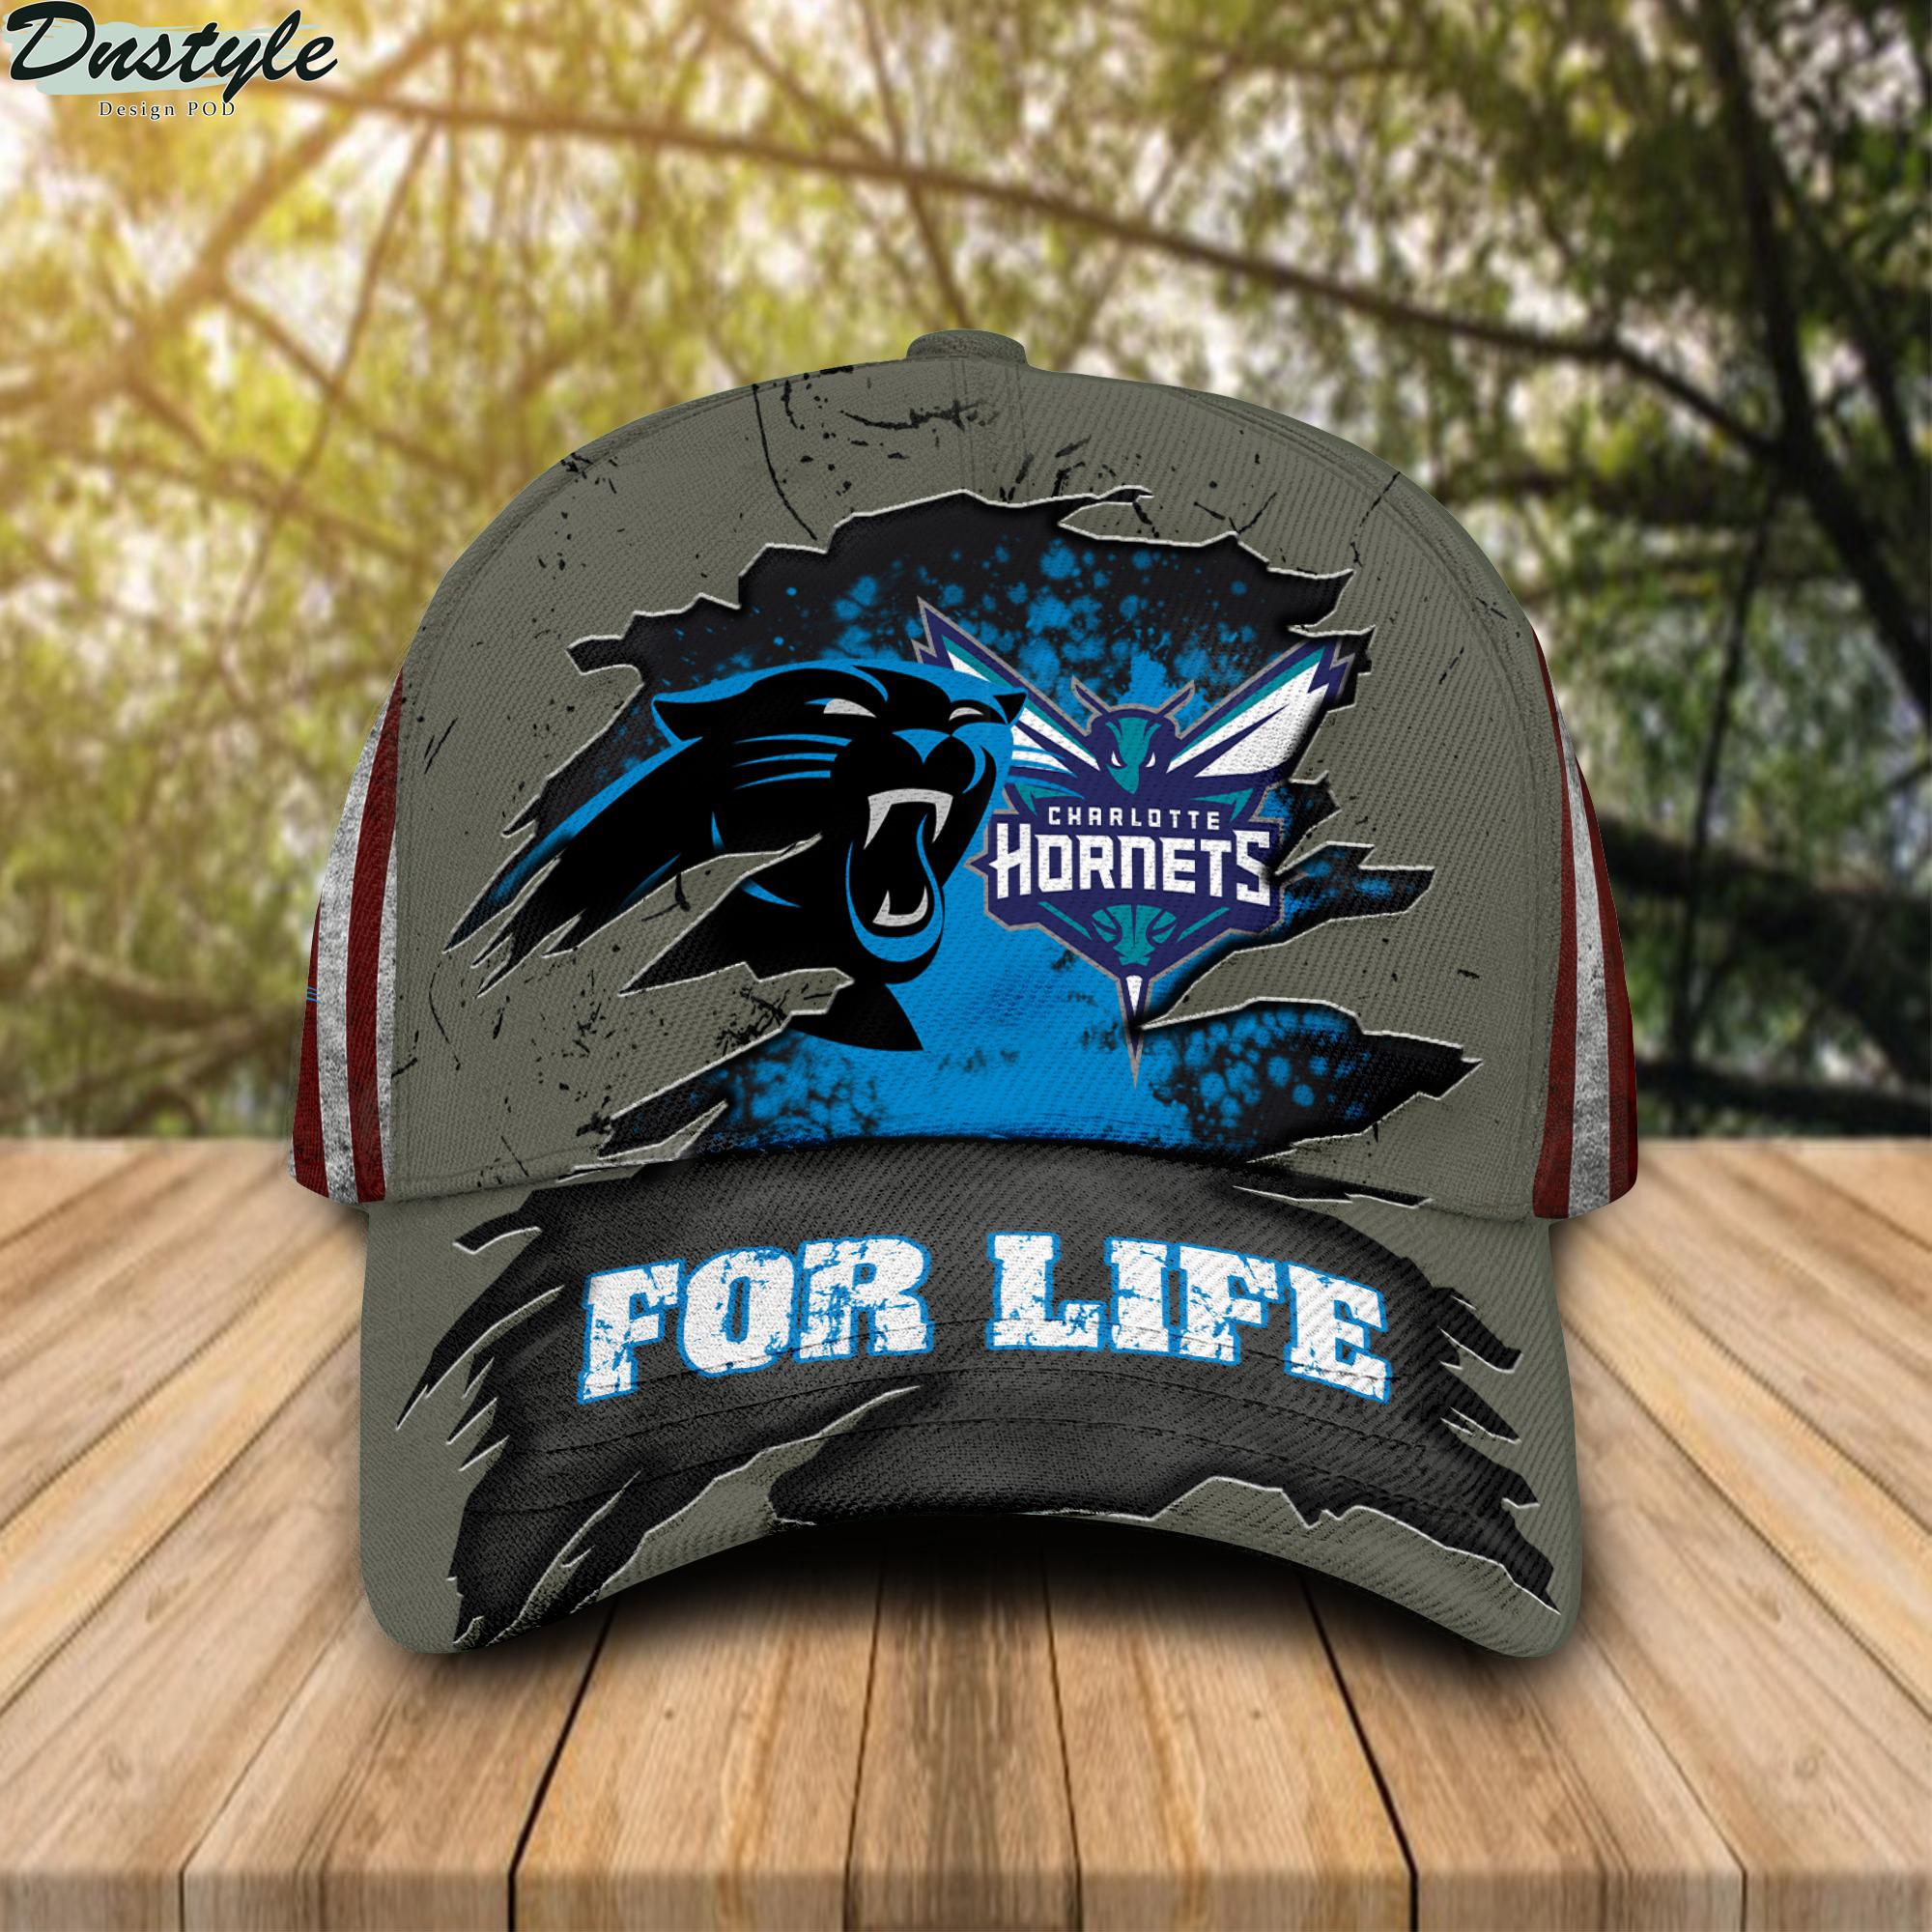 Carolina Panthers Charlotte Hornets for life cap